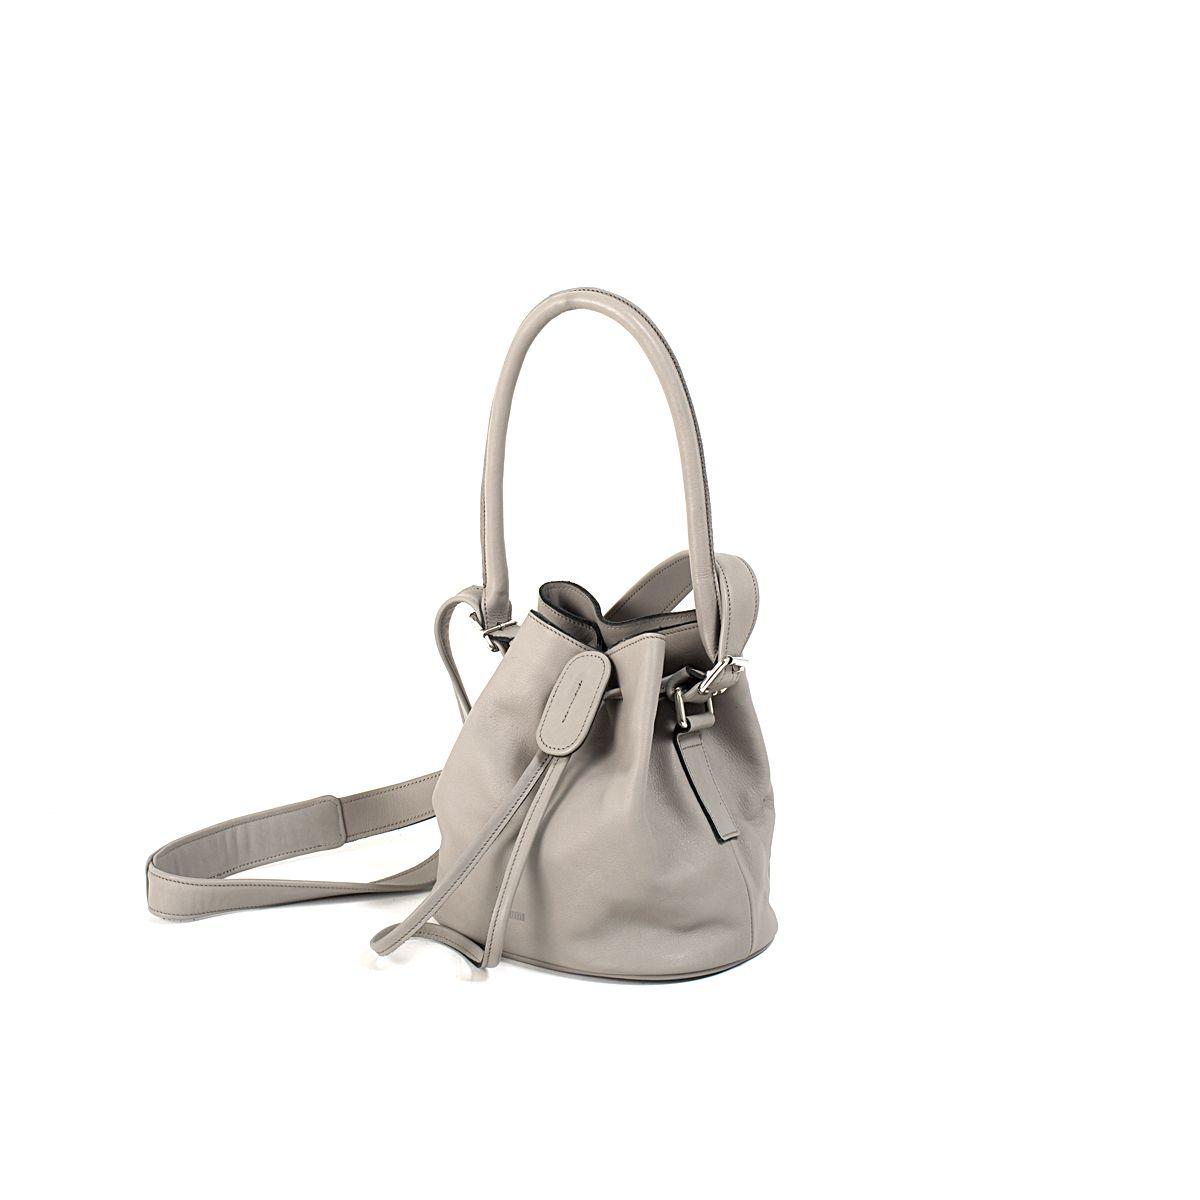 73403b7a31c90 Maaria Small Bucket Bag Grey-Black | Lumi Accessories | // B A G S ...